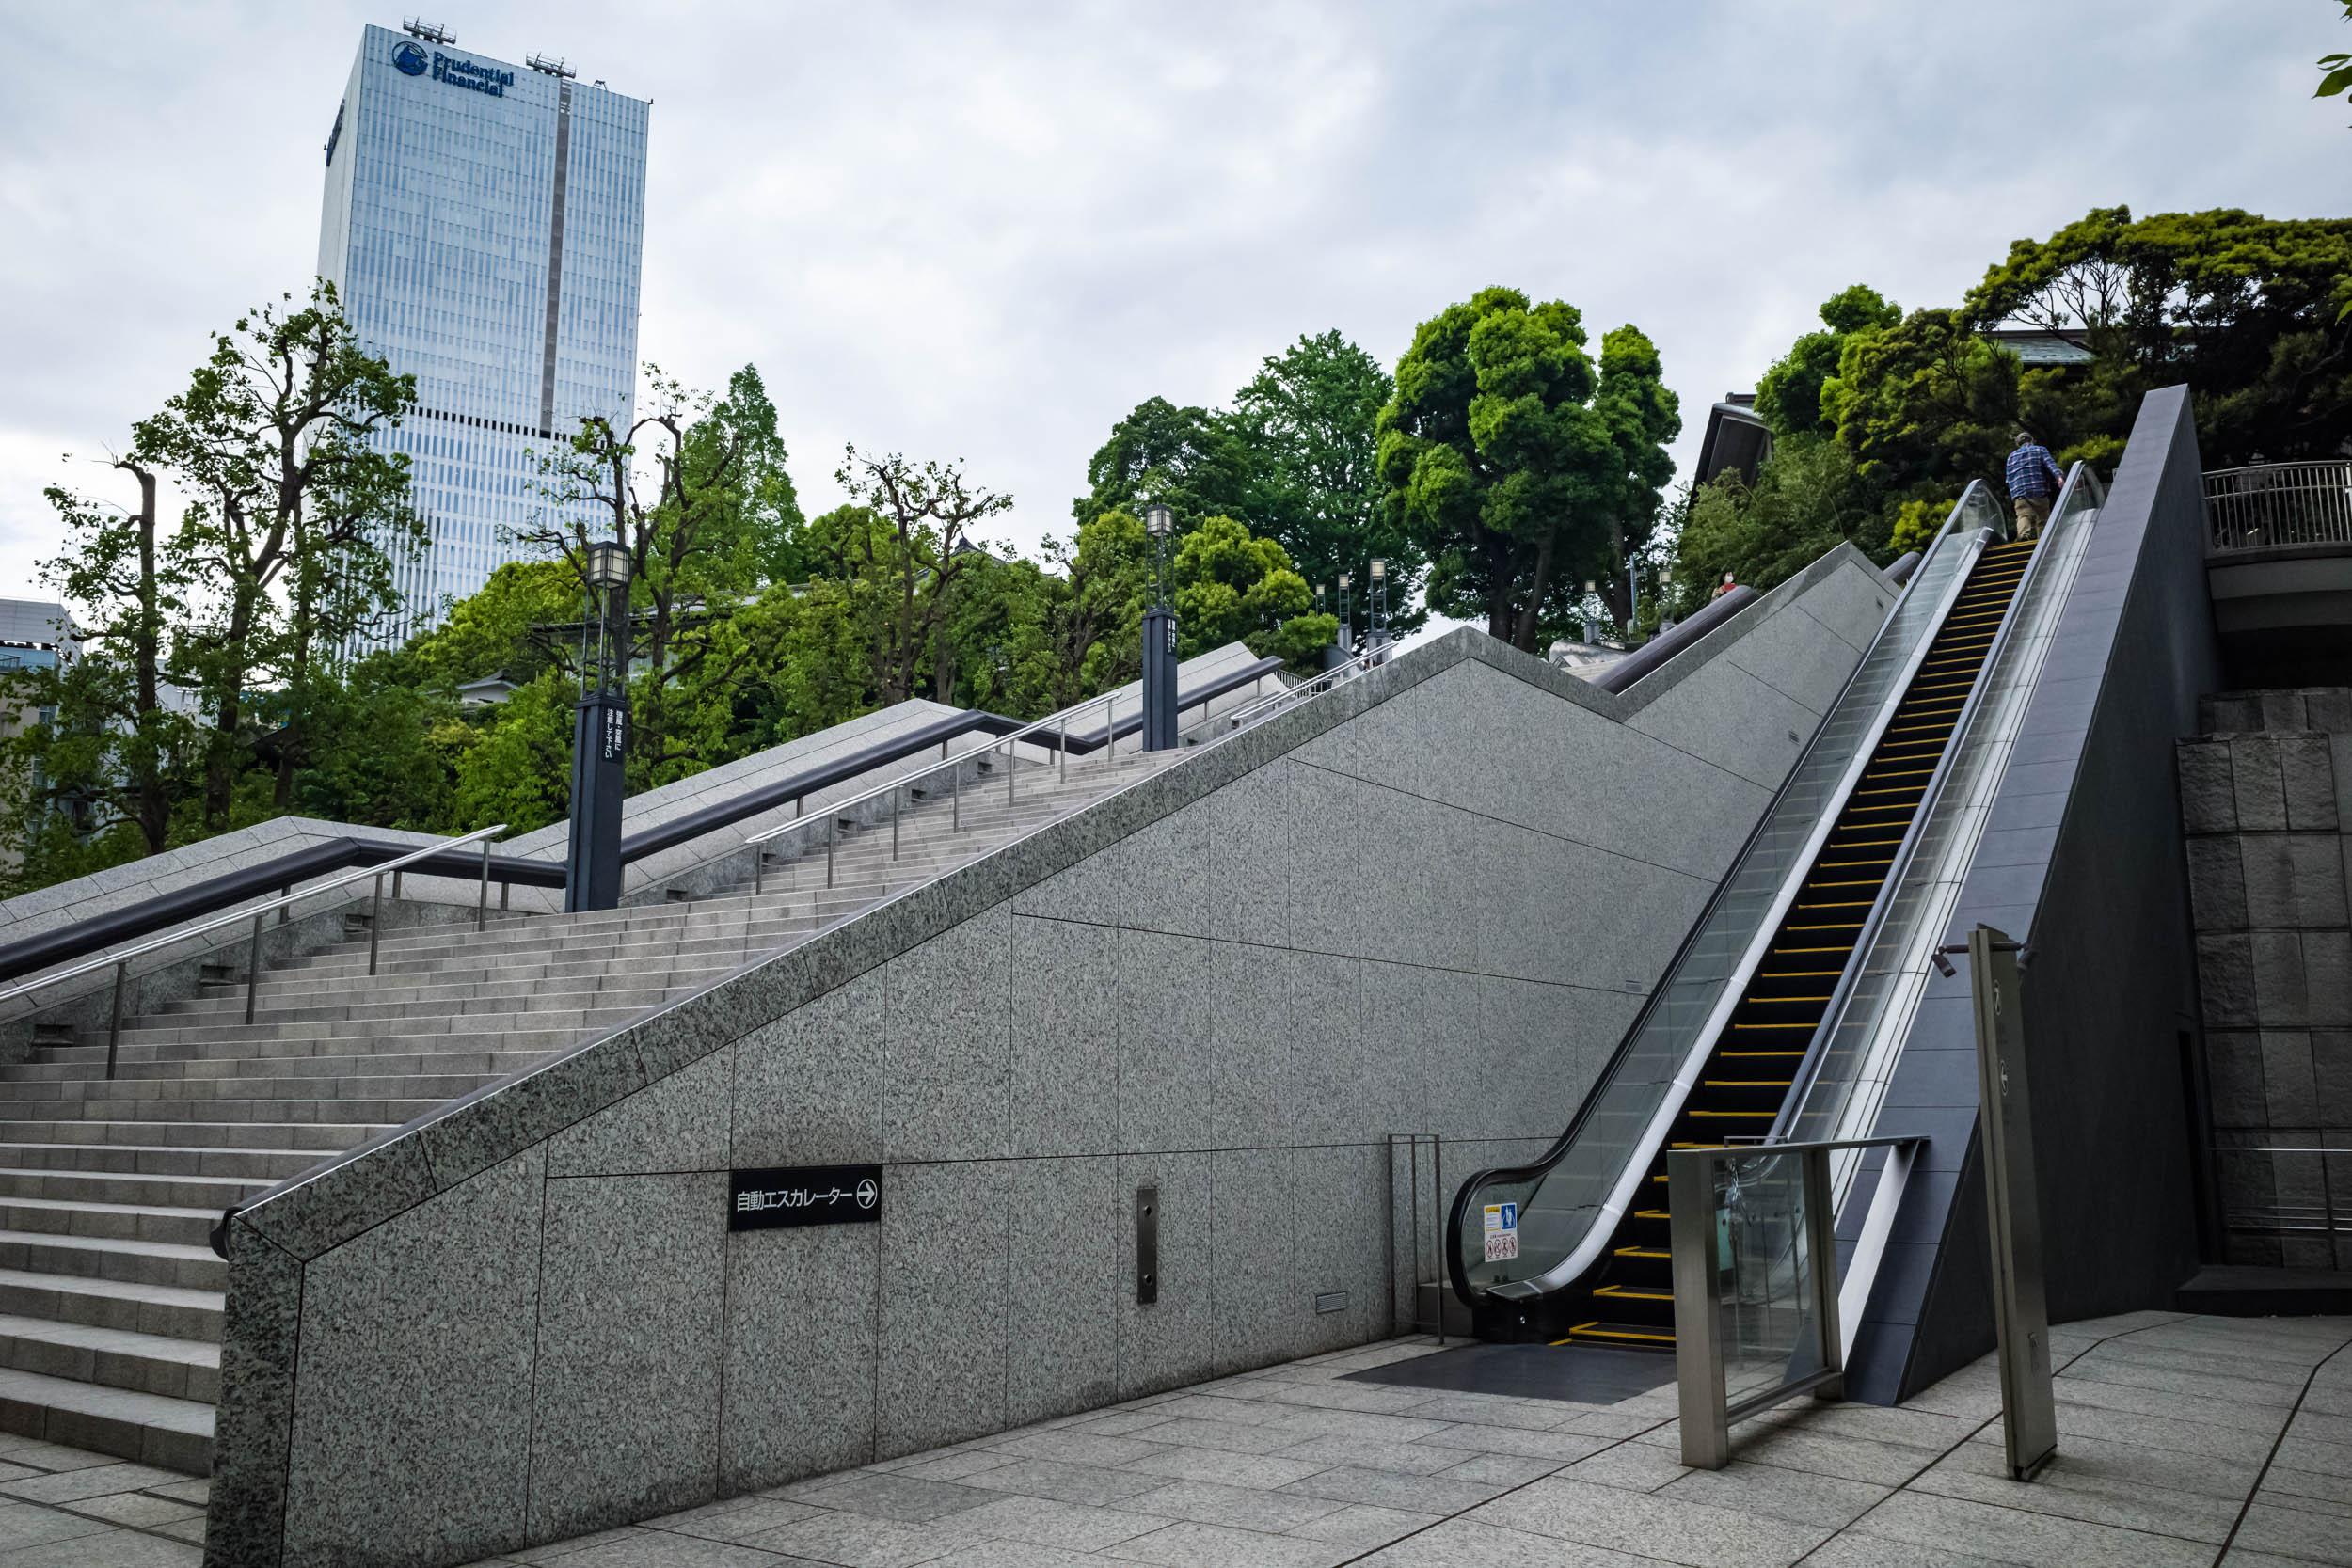 The first escalator